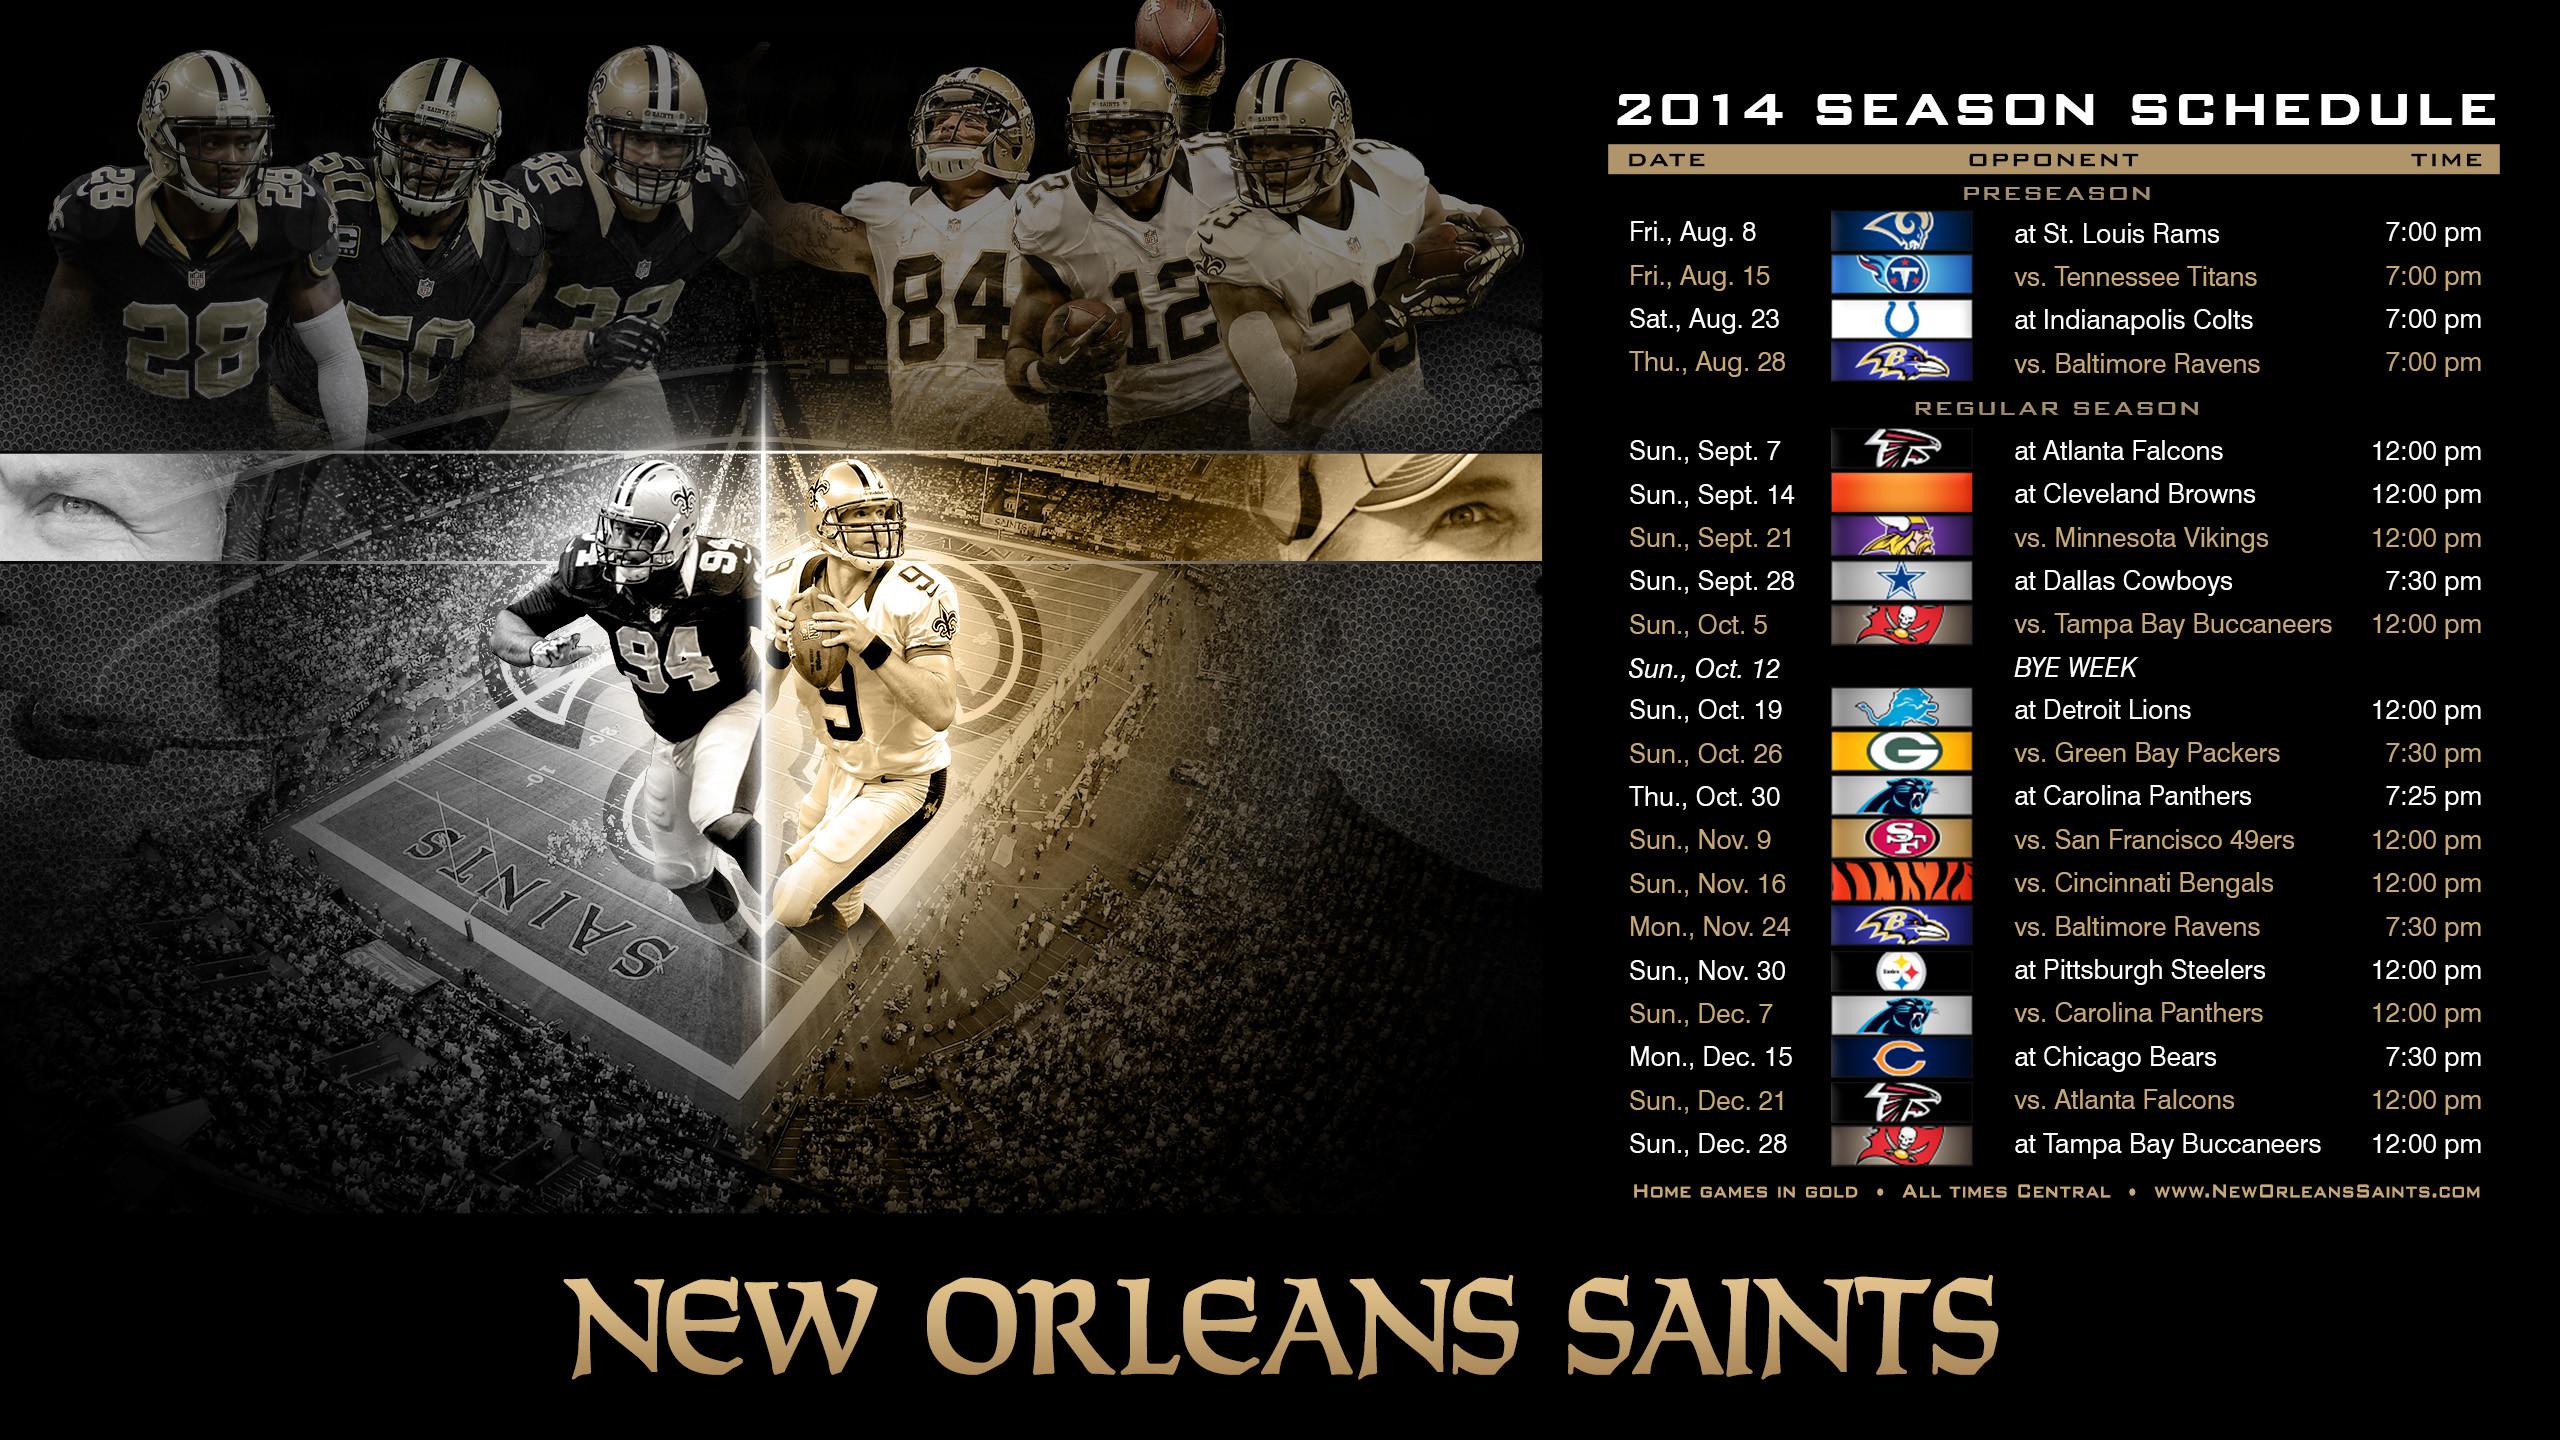 Jordan Graham Wallpaper: New Orleans Saints Desktop Wallpaper (69+ Images